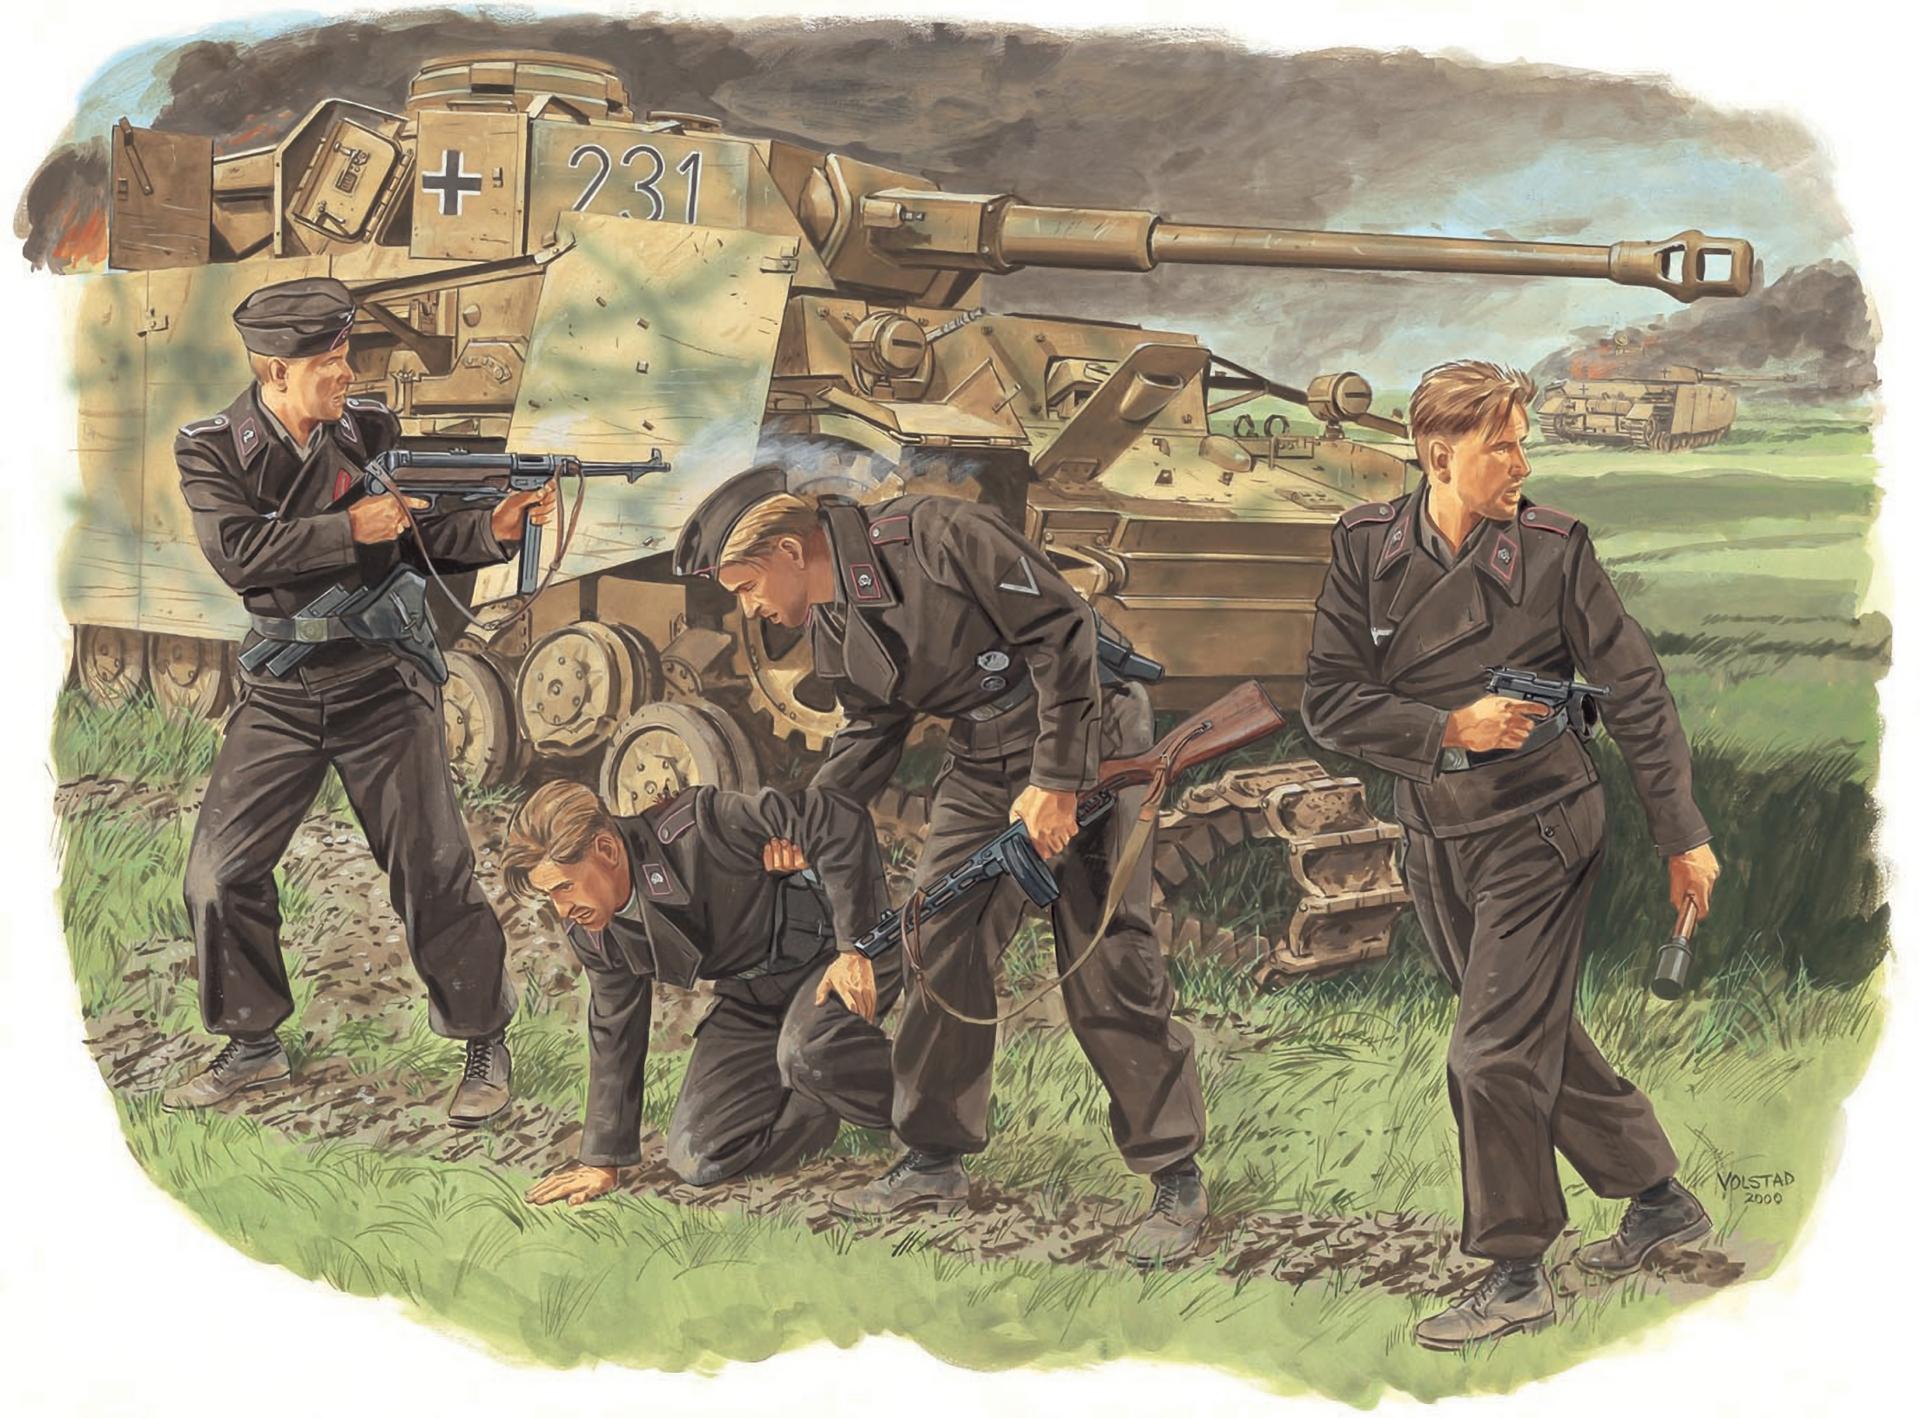 рисунок Survivors, Panzer Crew (Kursk 1943)